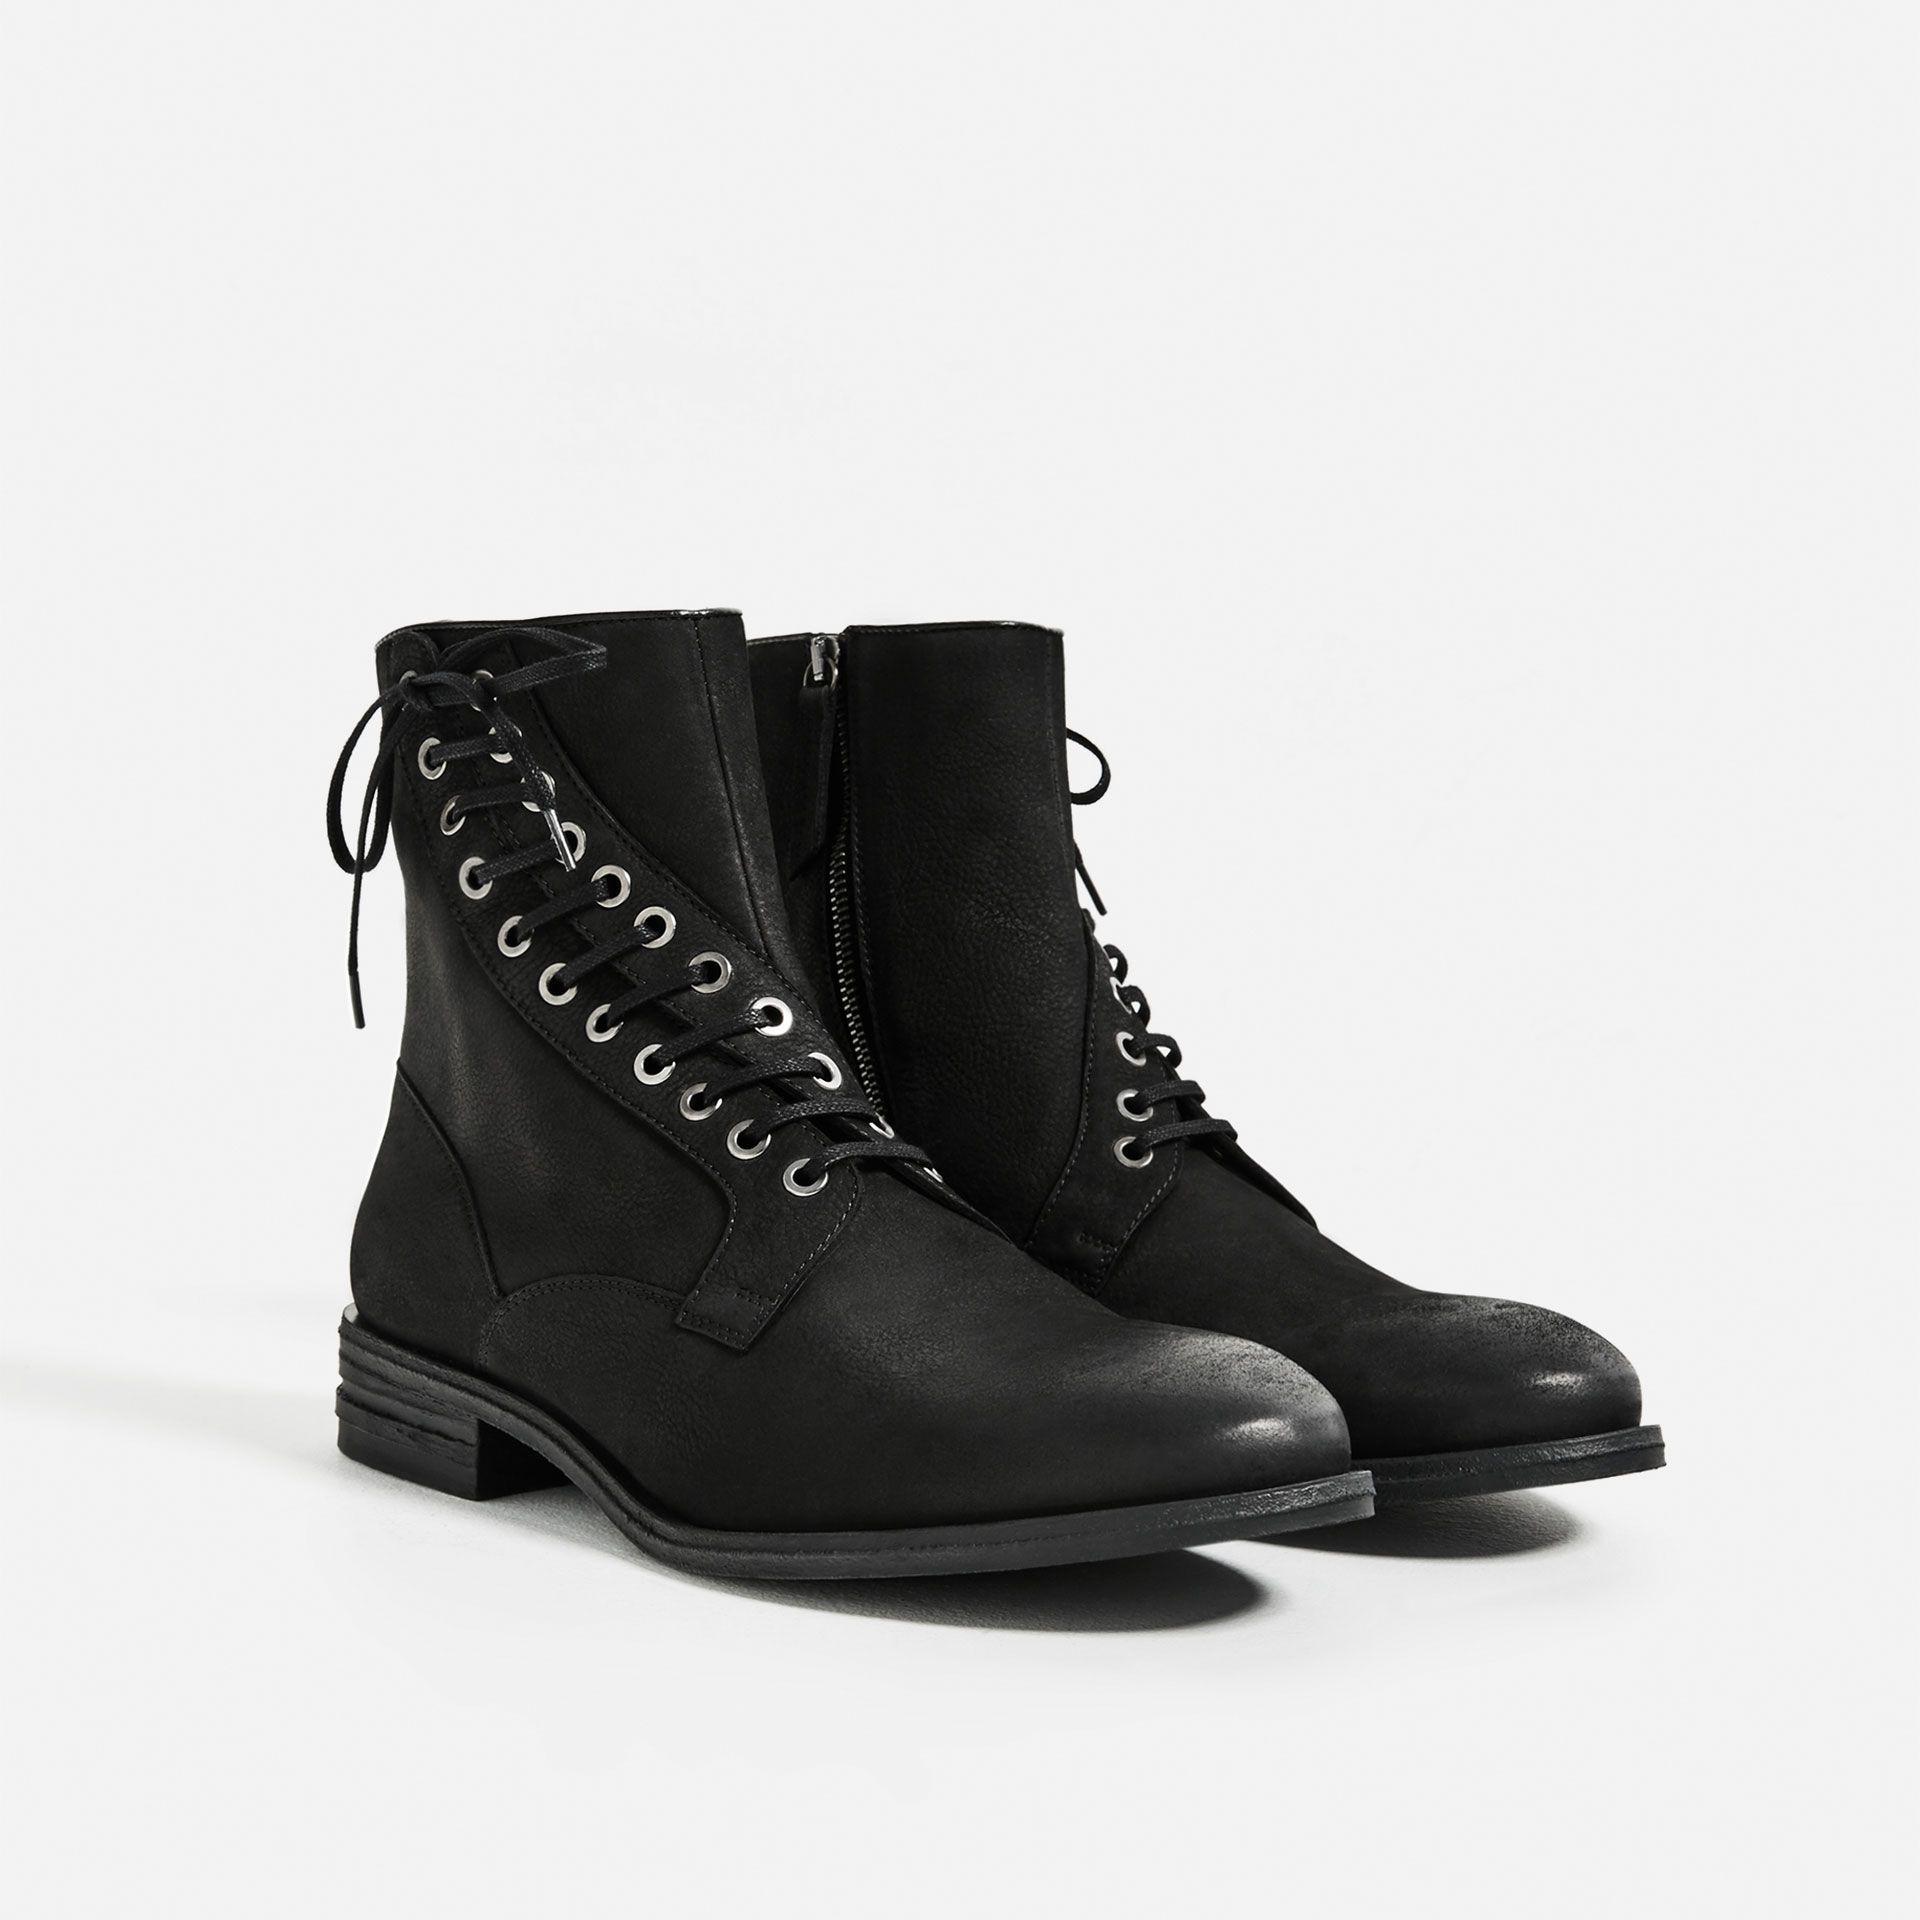 2016 Hot Sale Rockport Street Escape Leather Lace Up Boots Men Brown FXXFP59